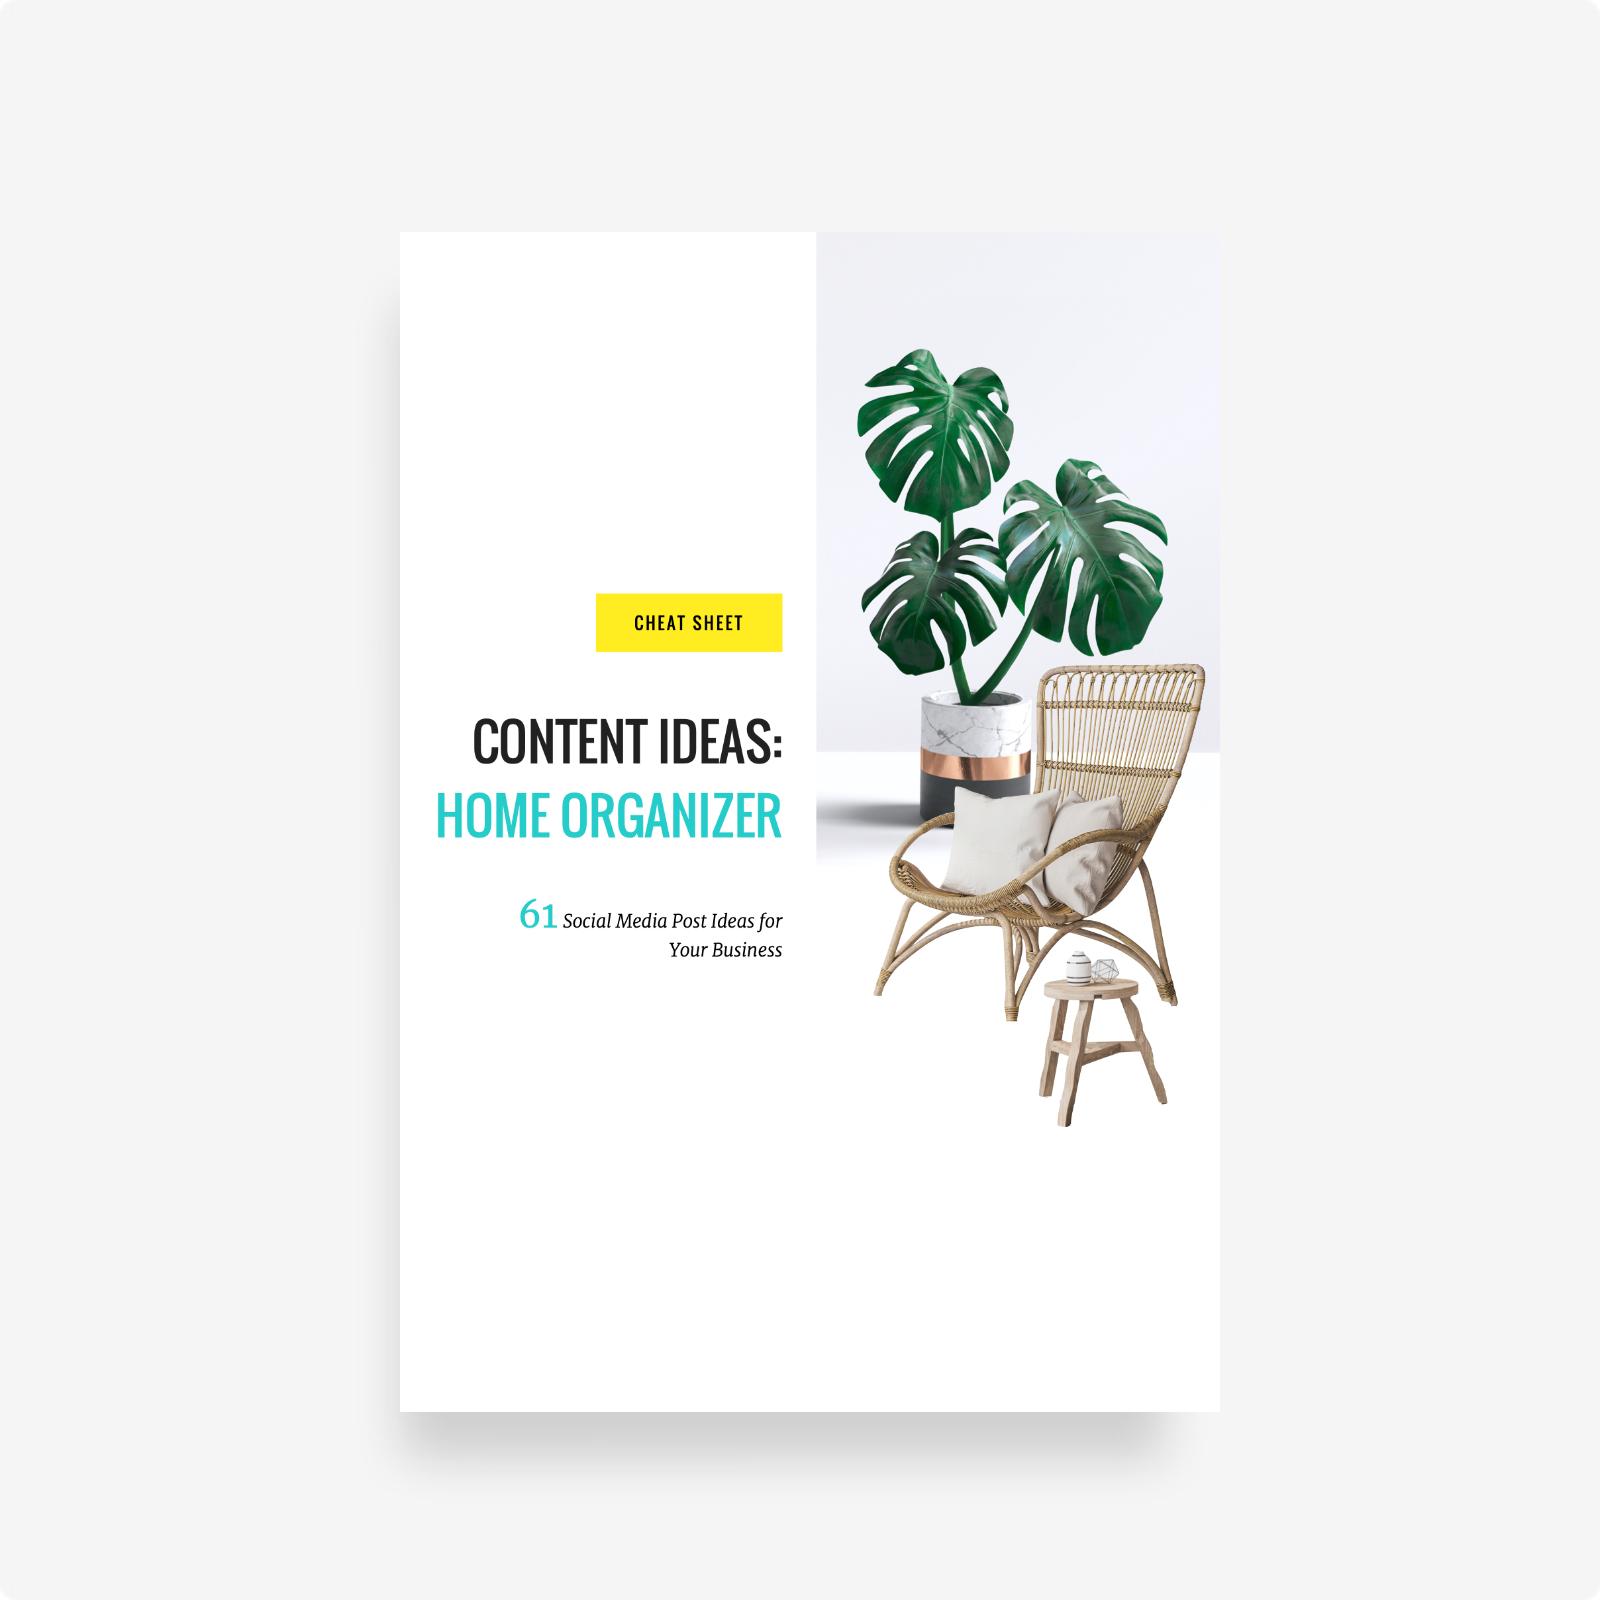 davaii-61-content-ideas-home-organizer